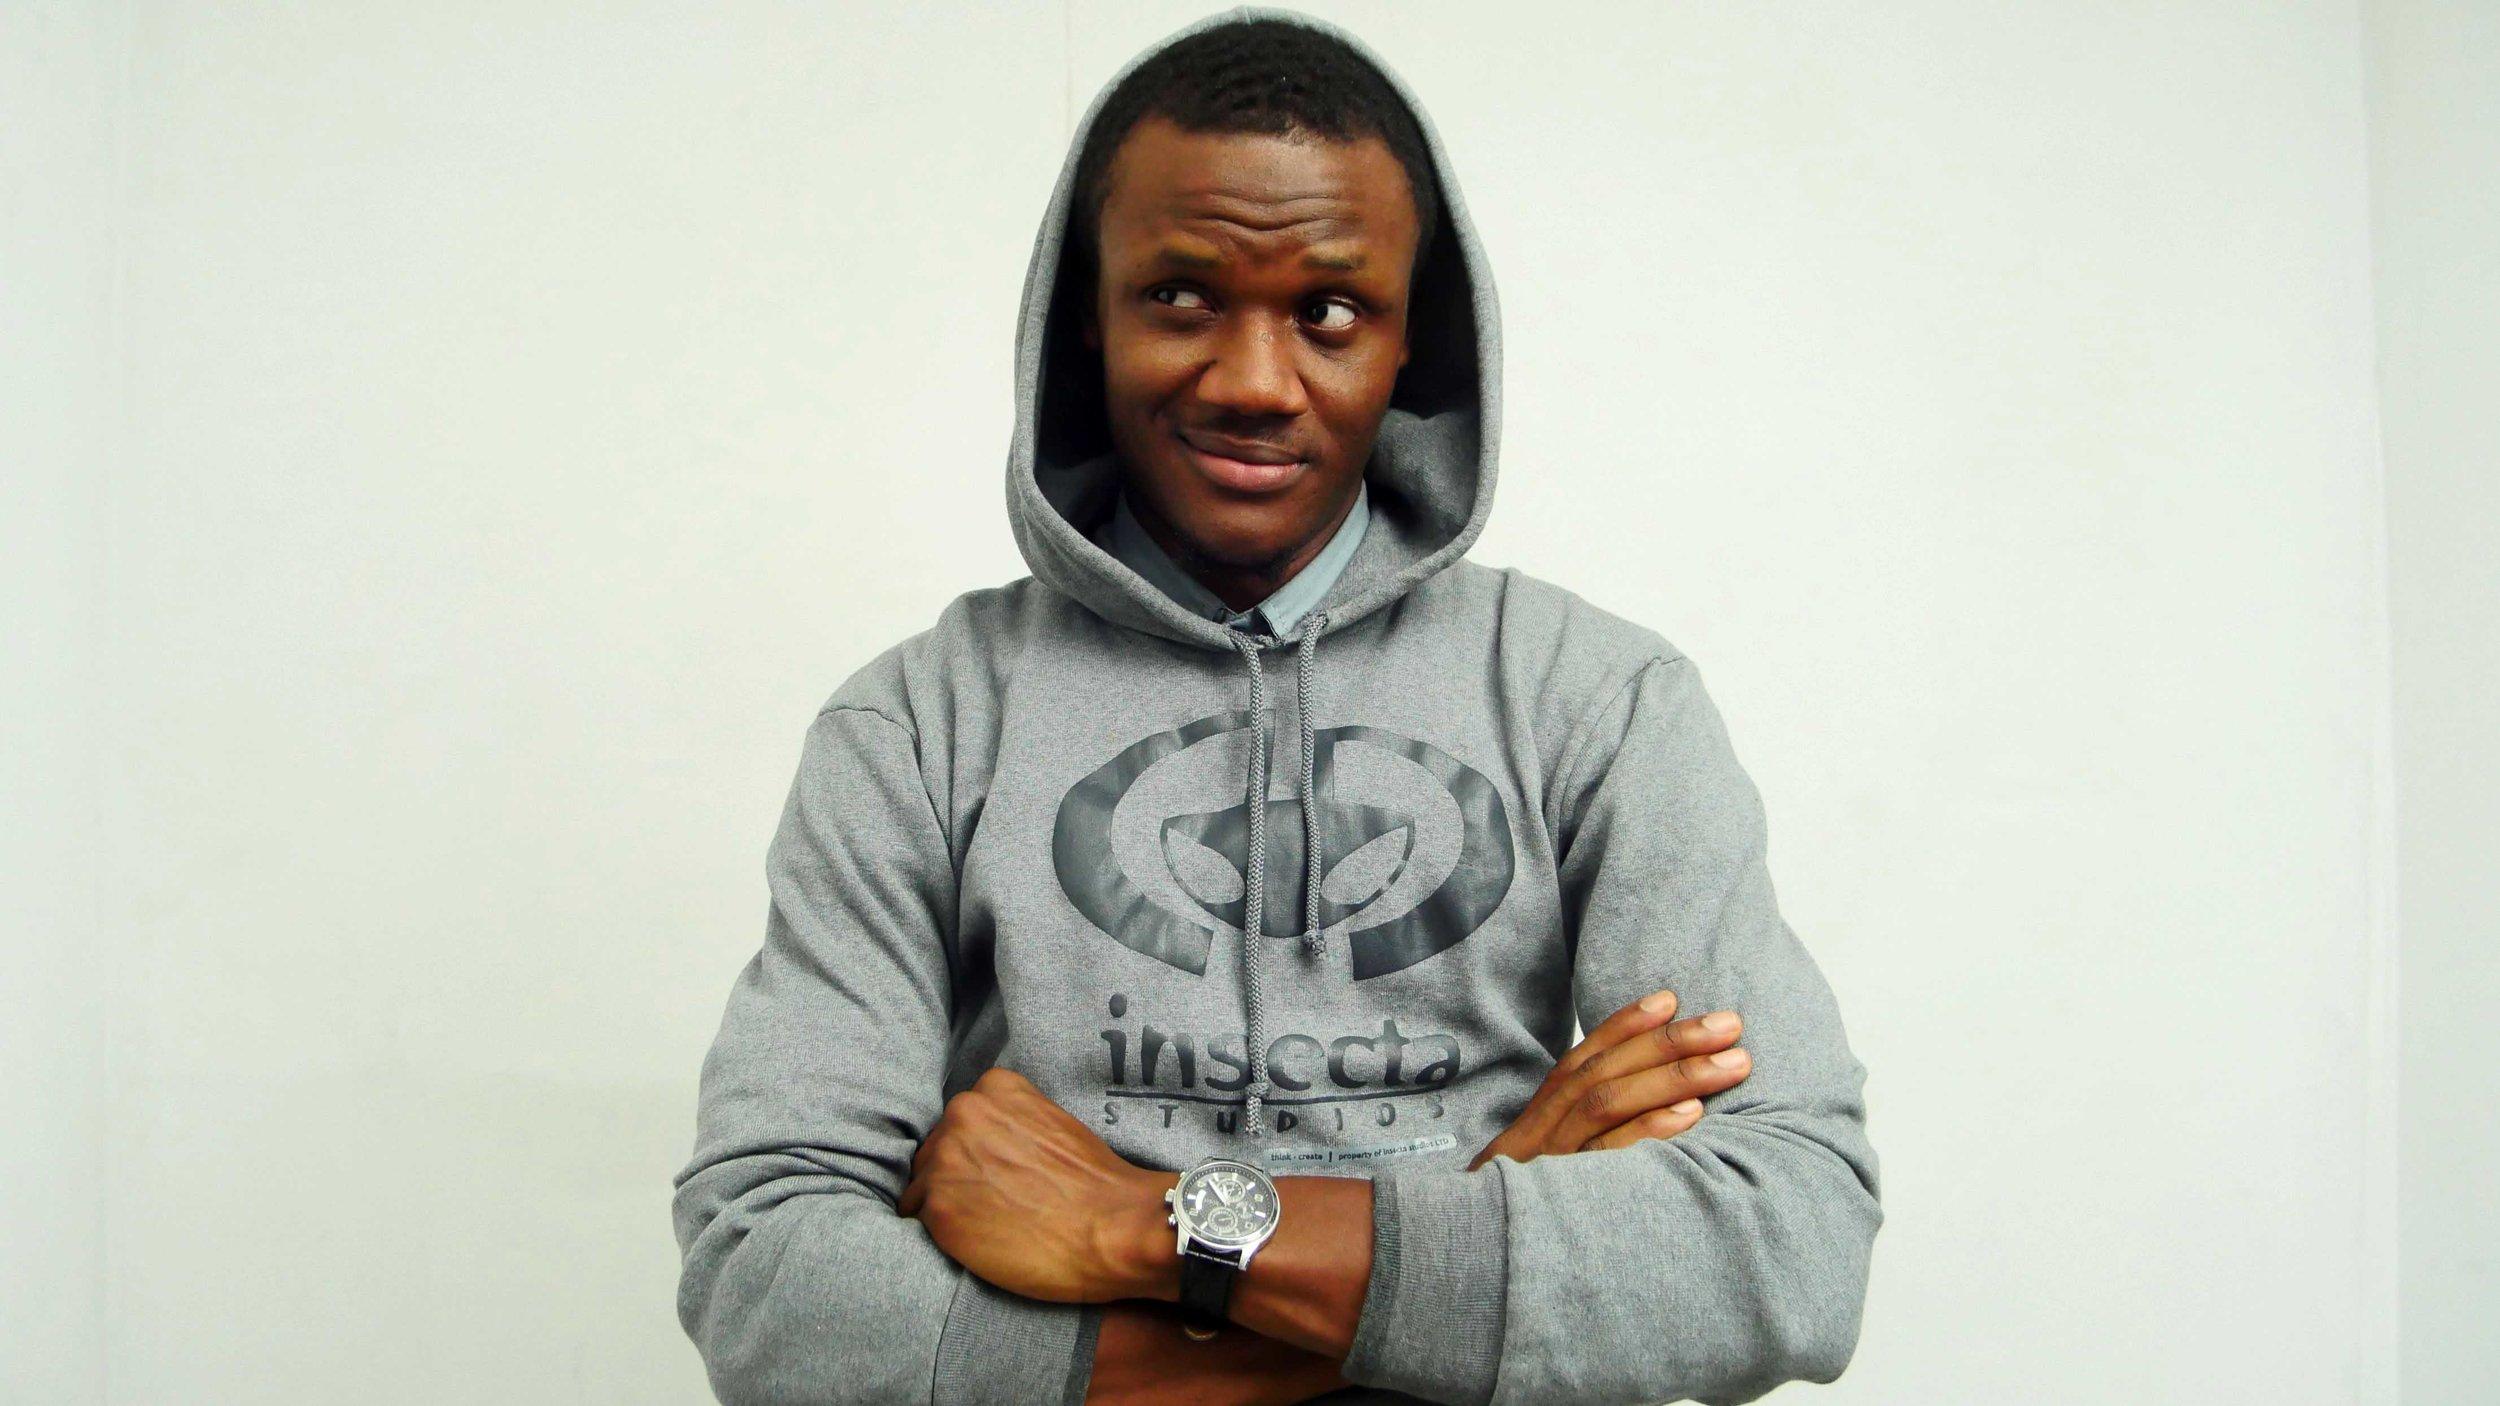 Anthony Ezeokoye (Anth_insecta) (7).jpg